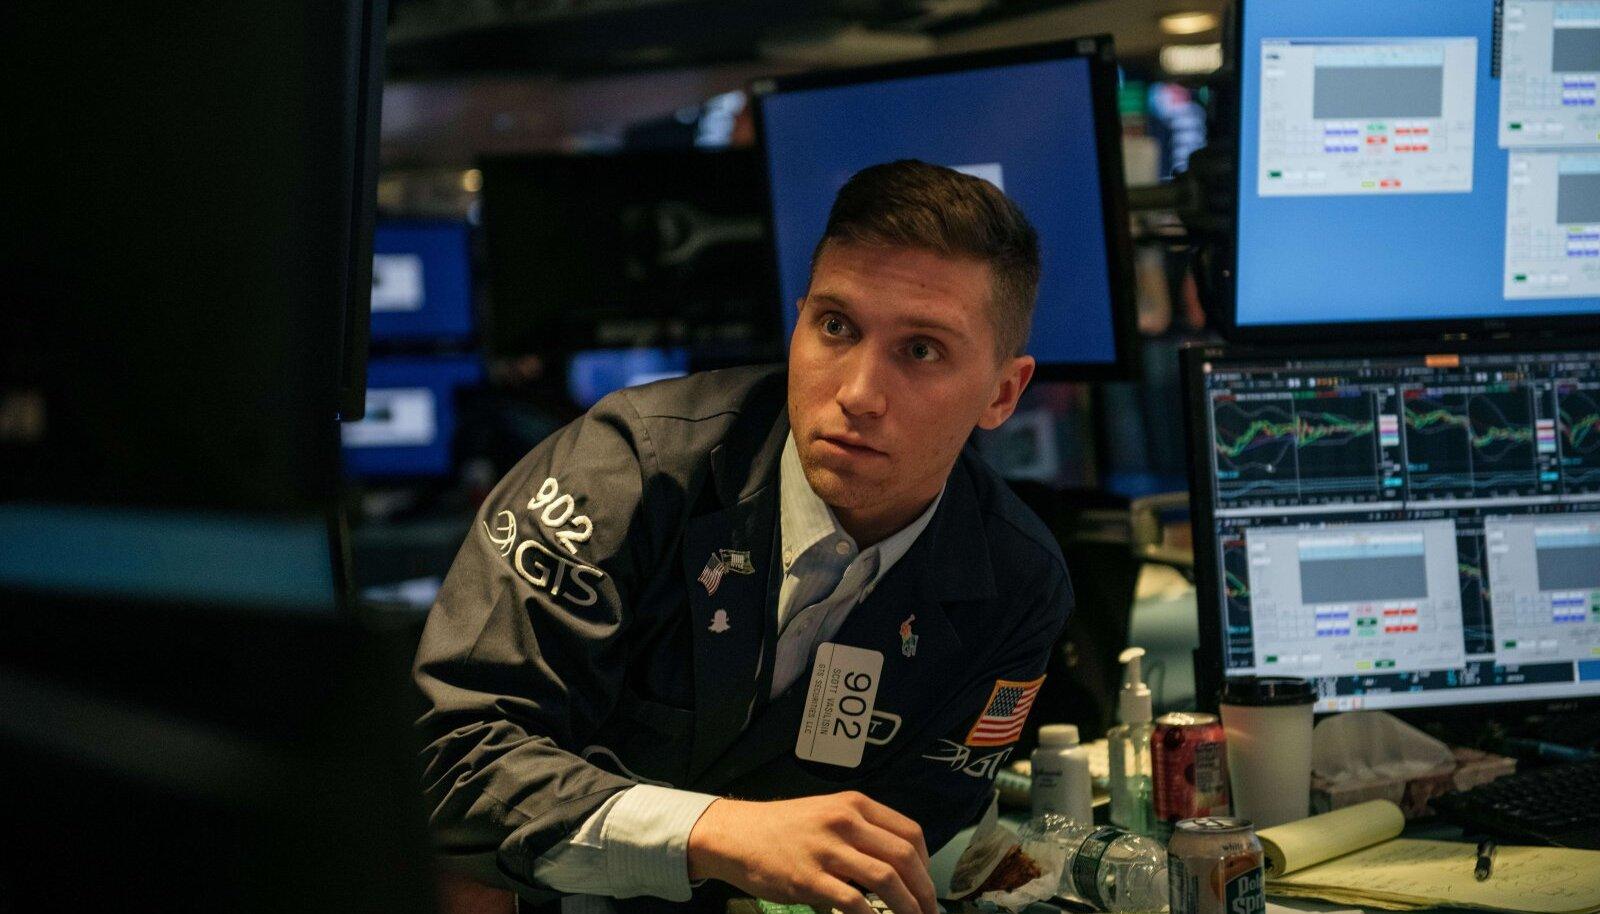 USA börsimaakler